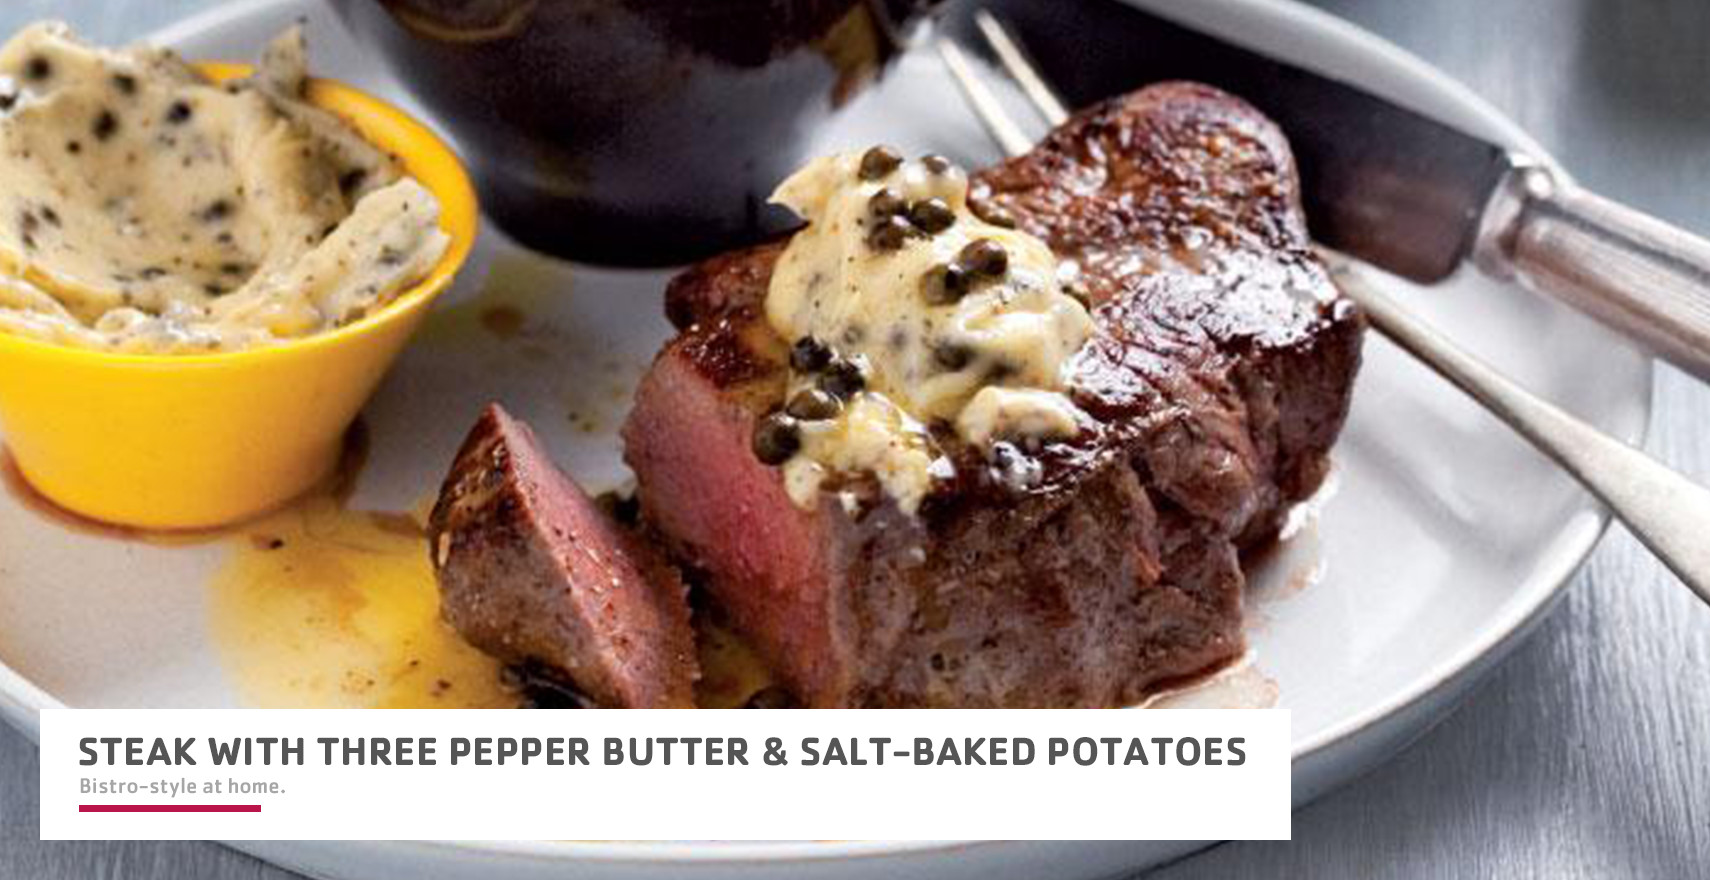 Steak with three pepper butter & salt-baked potatoes header image.jpg